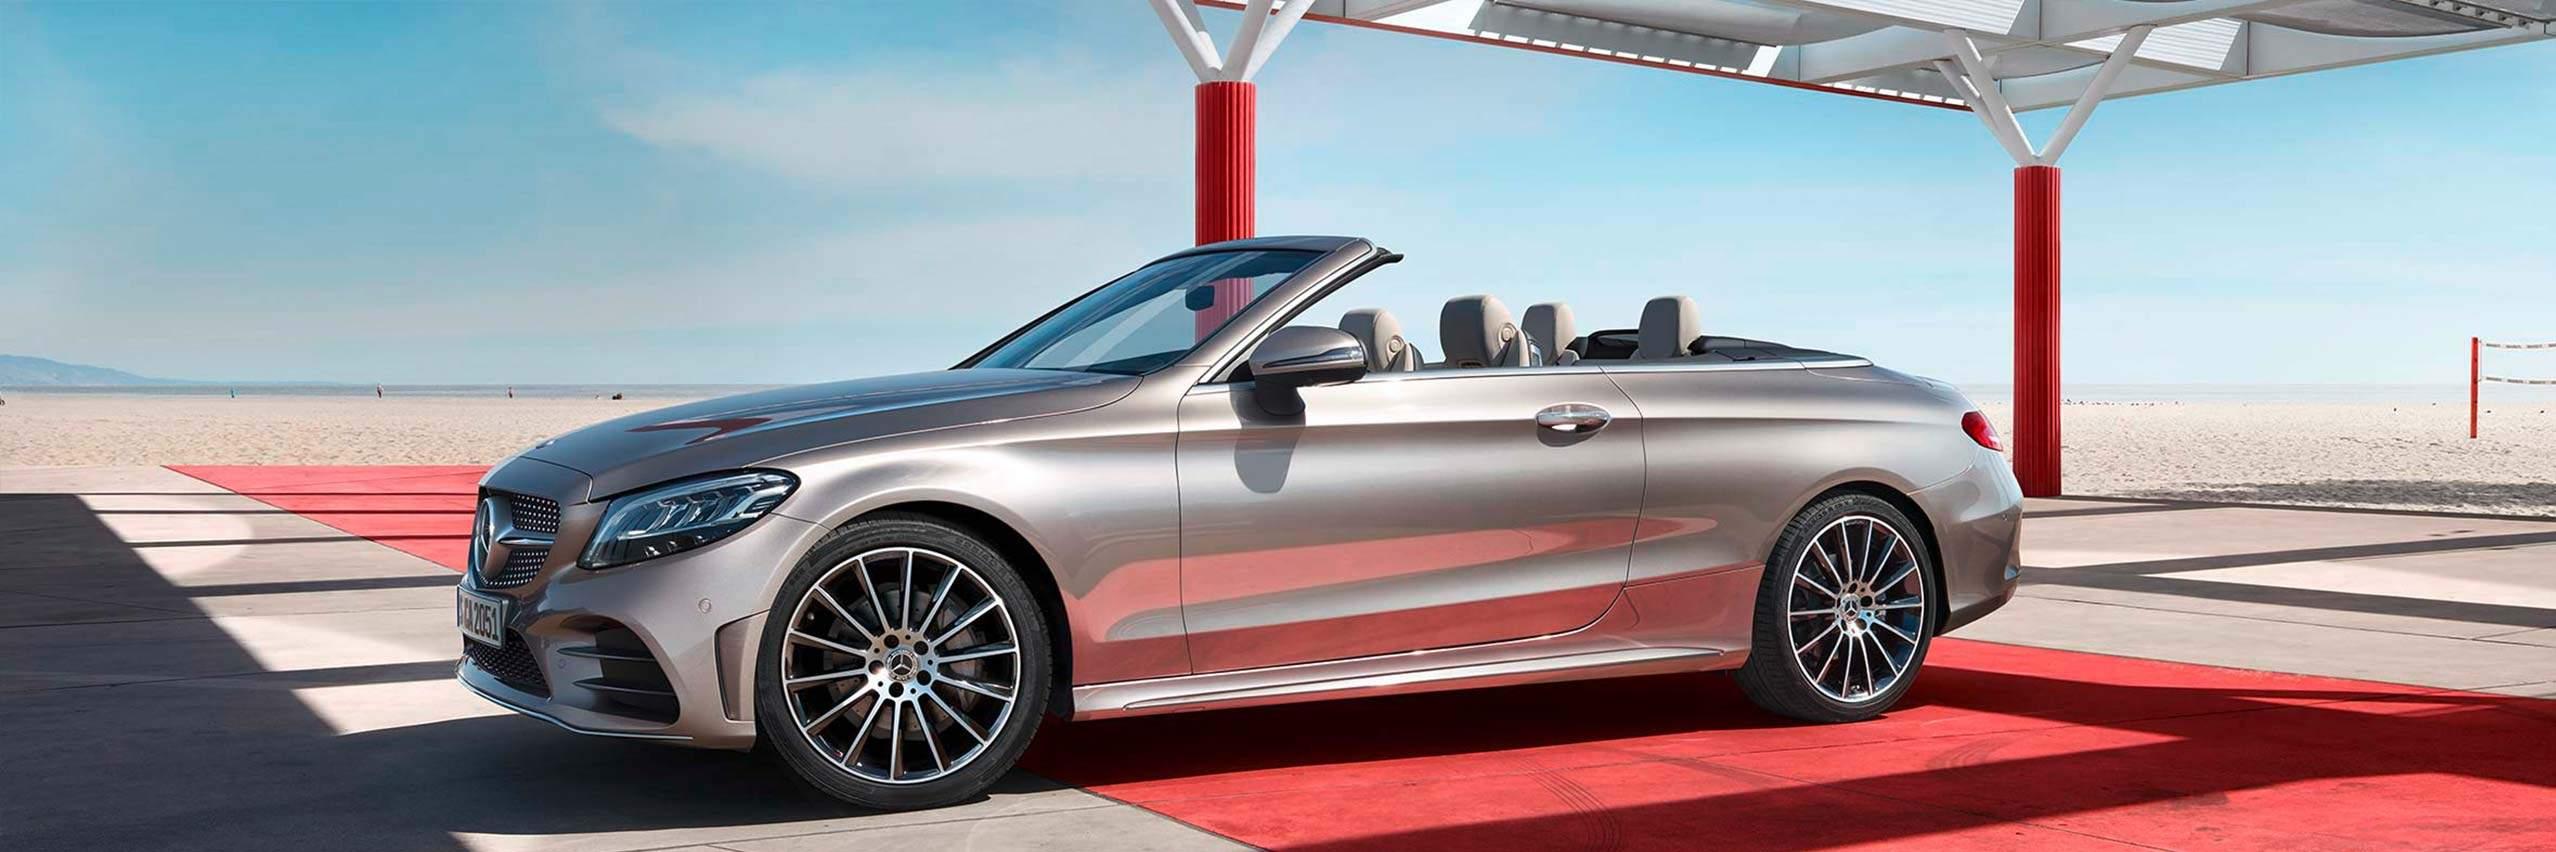 CAR-Avenue-Mercedes-C-Cabriolet-07